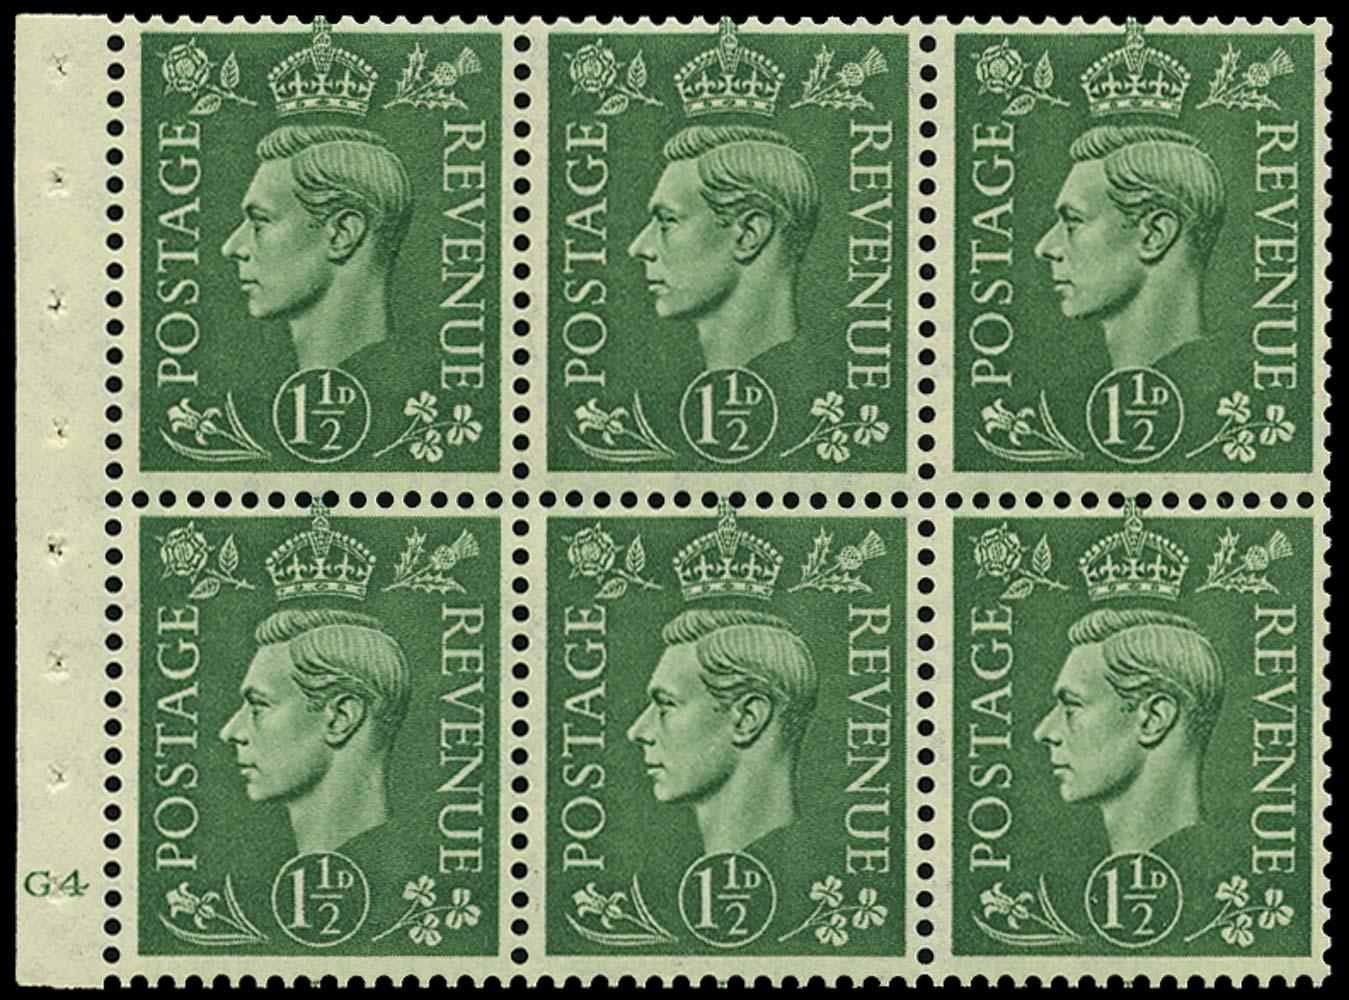 GB 1951  SG505b Booklet pane G4 (no dot)